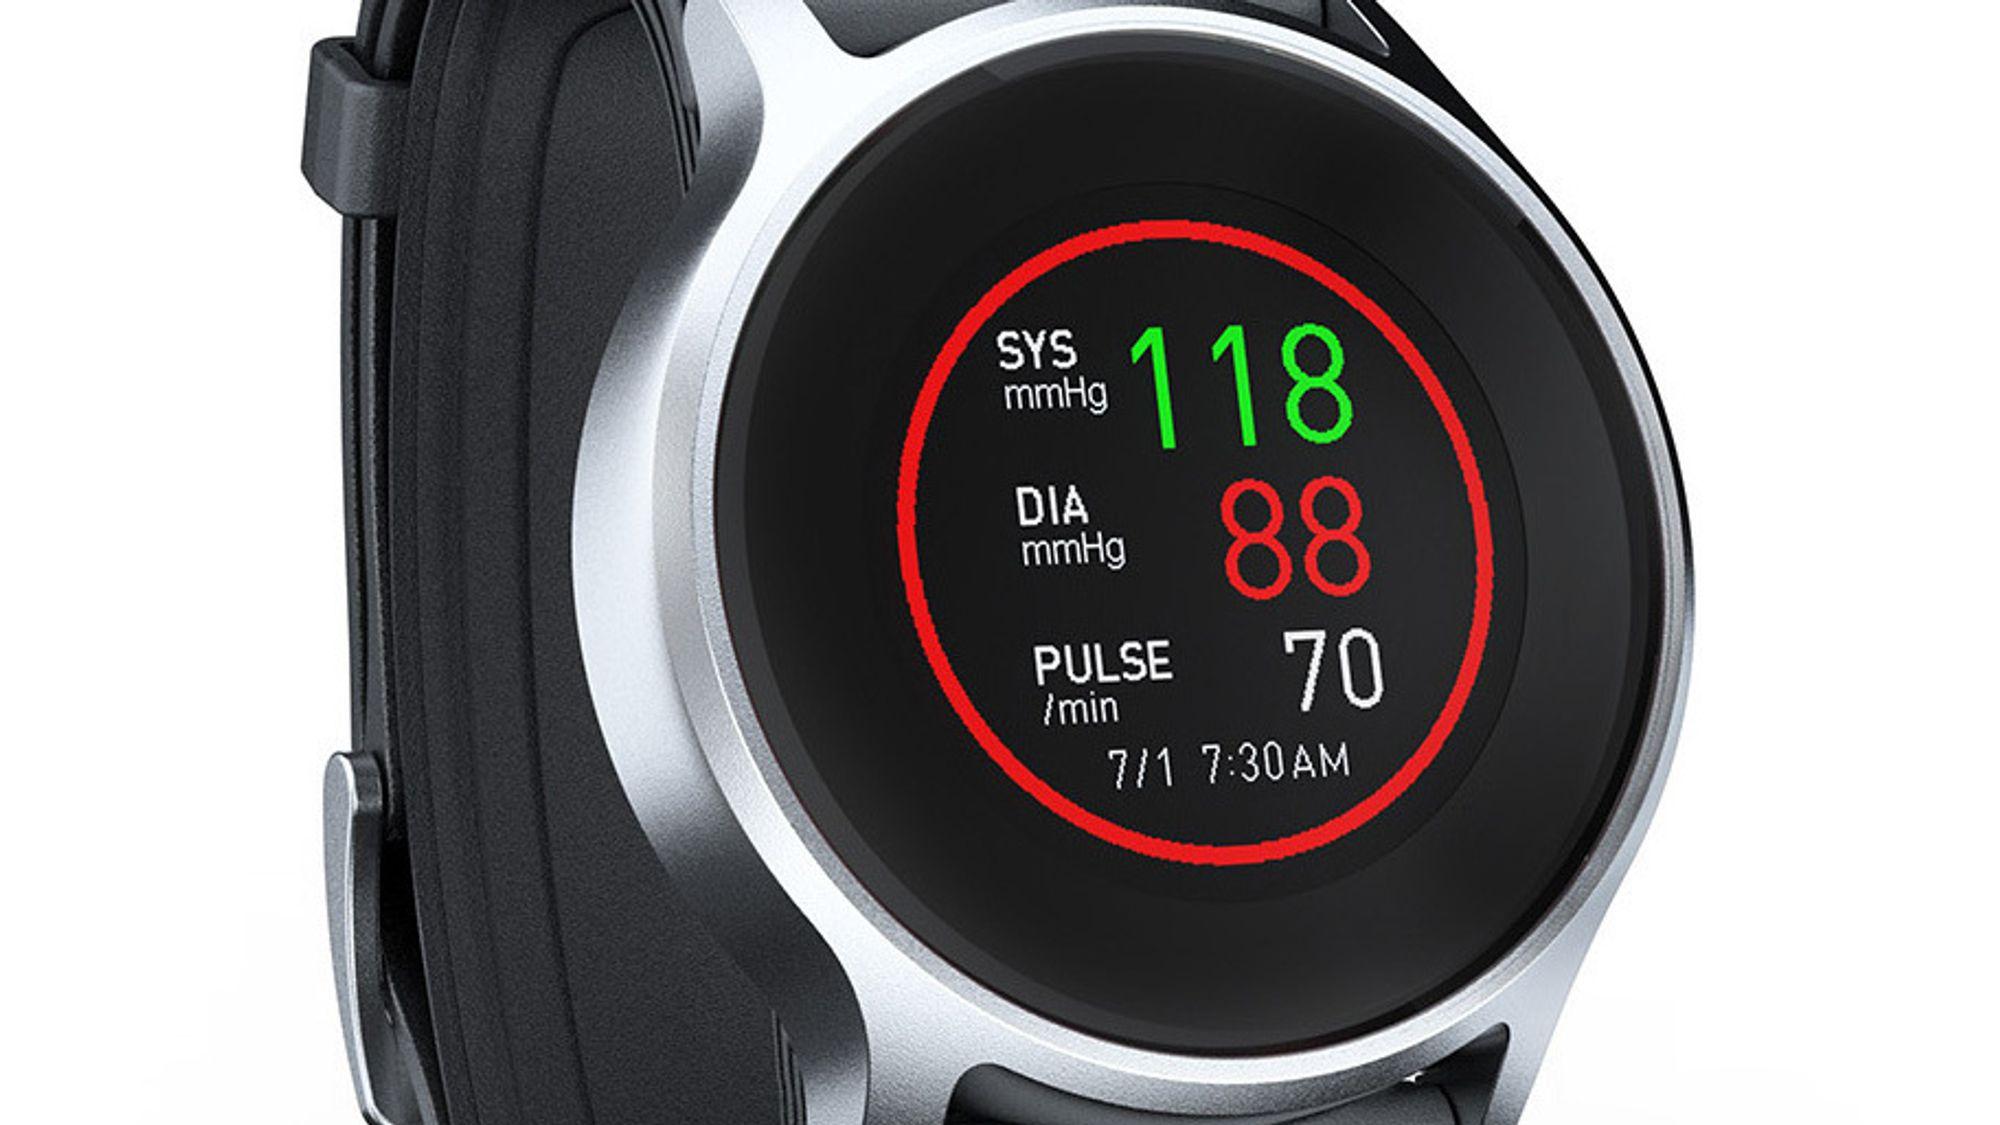 Smartere smartklokke: Etter flere år på CES er Omrons smartklokke med innebygget blodtrykksmåler endelig i salg.